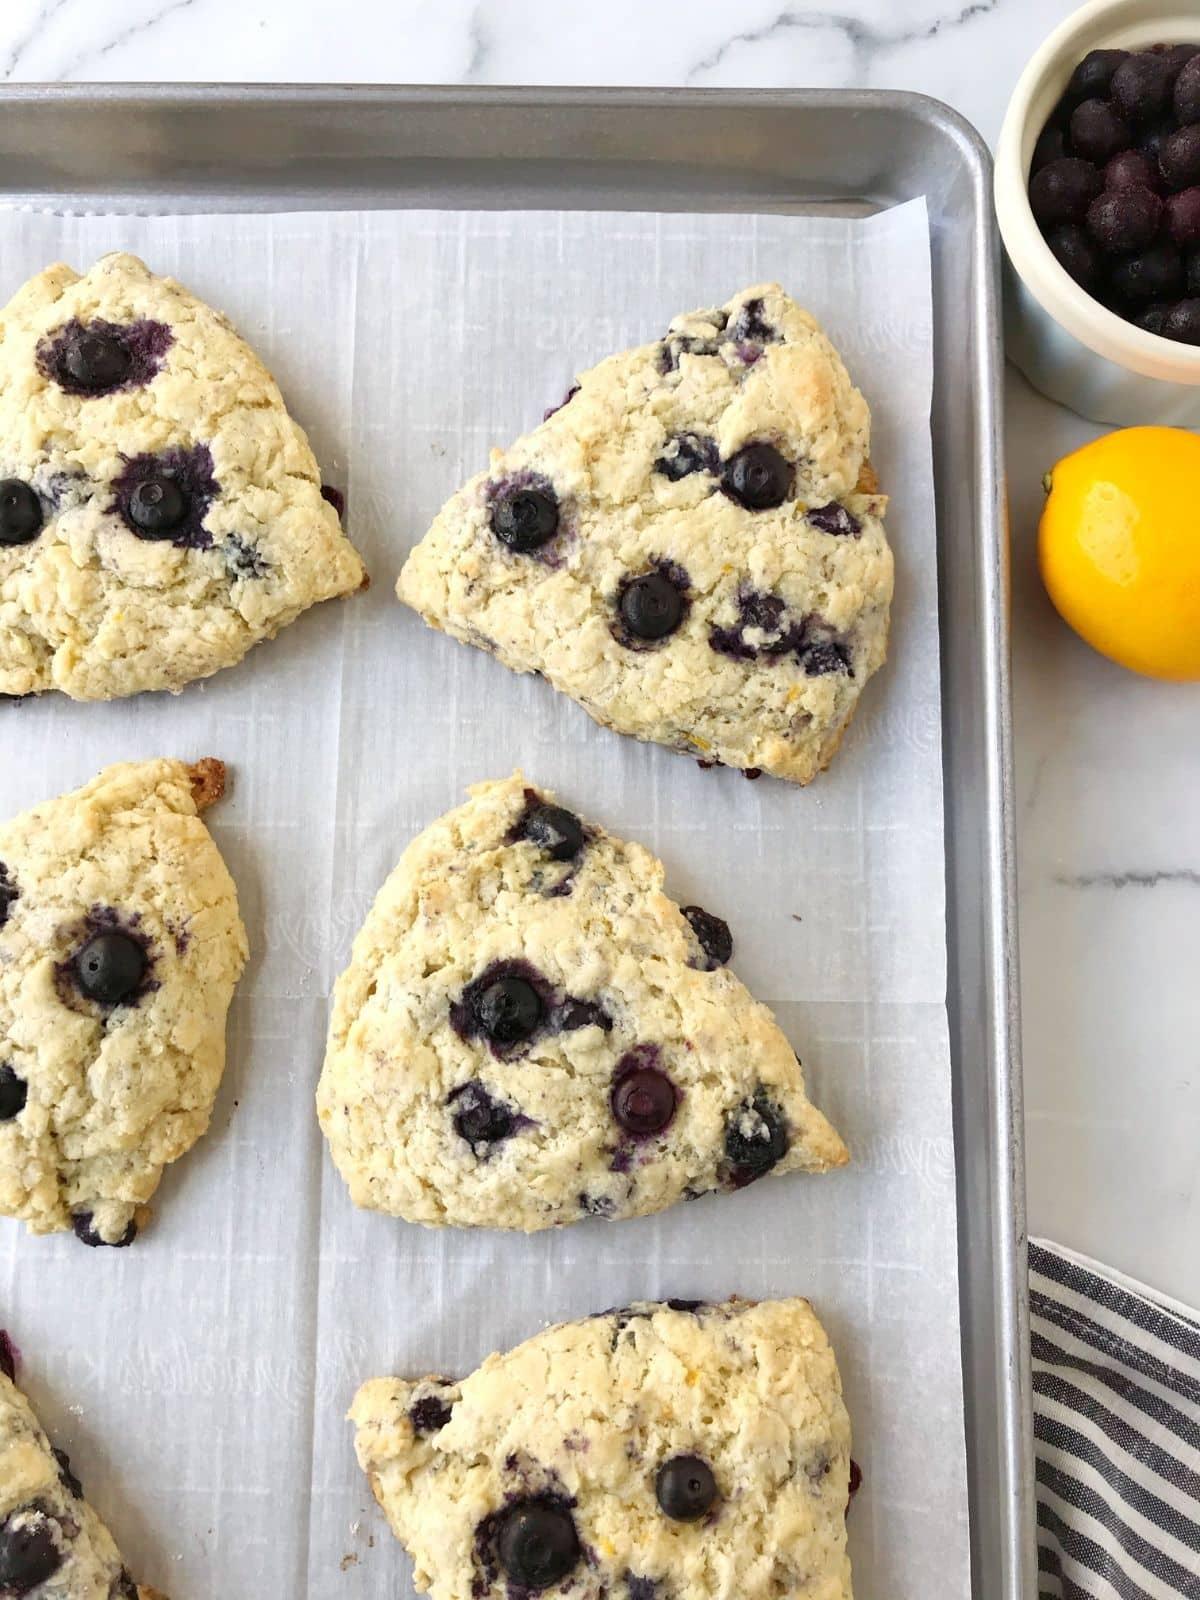 freshly baked scones on a sheet pan